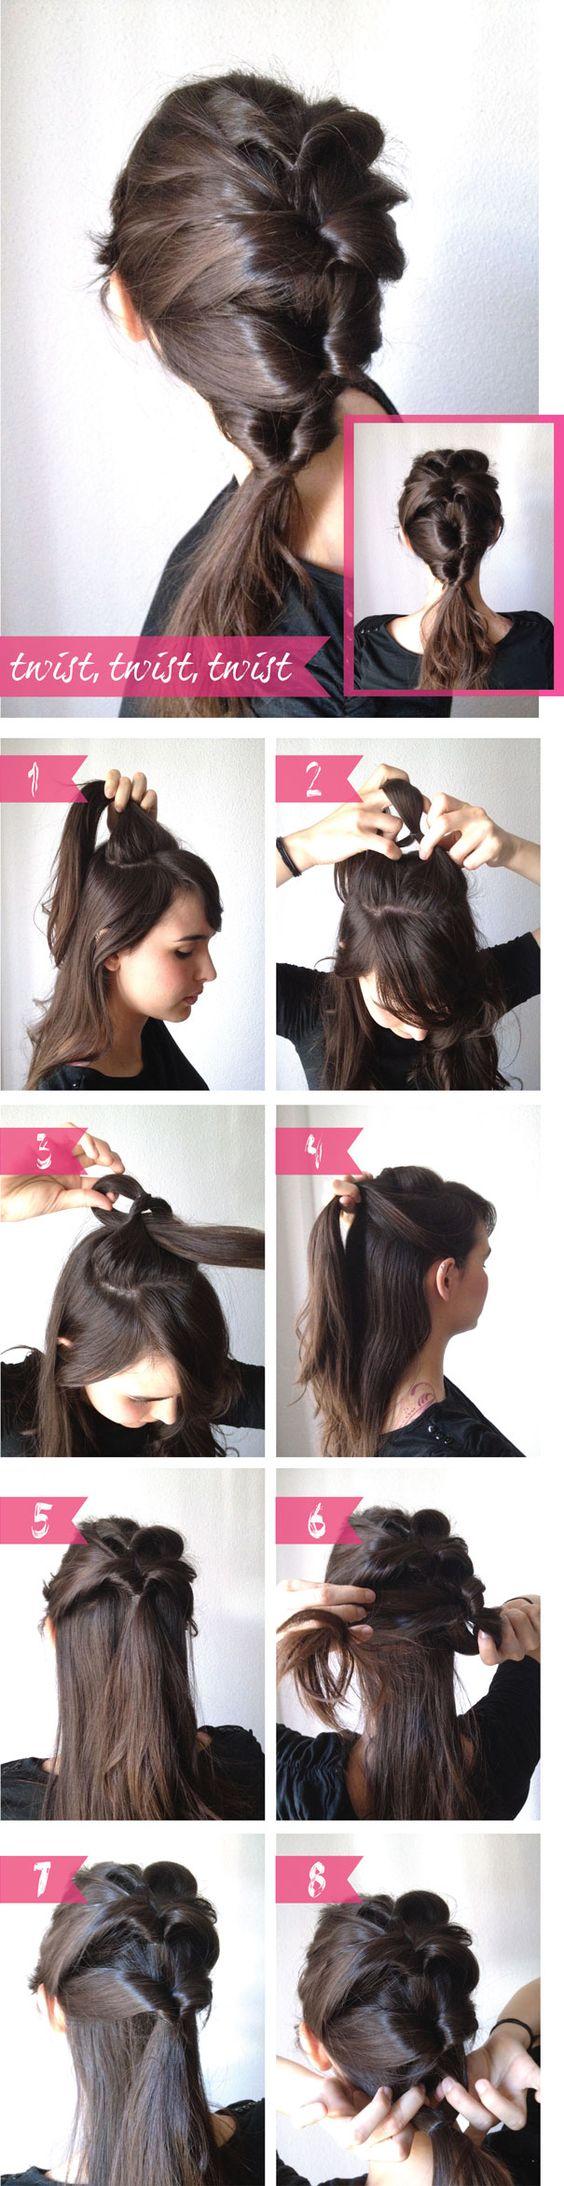 Join the Mood: hair